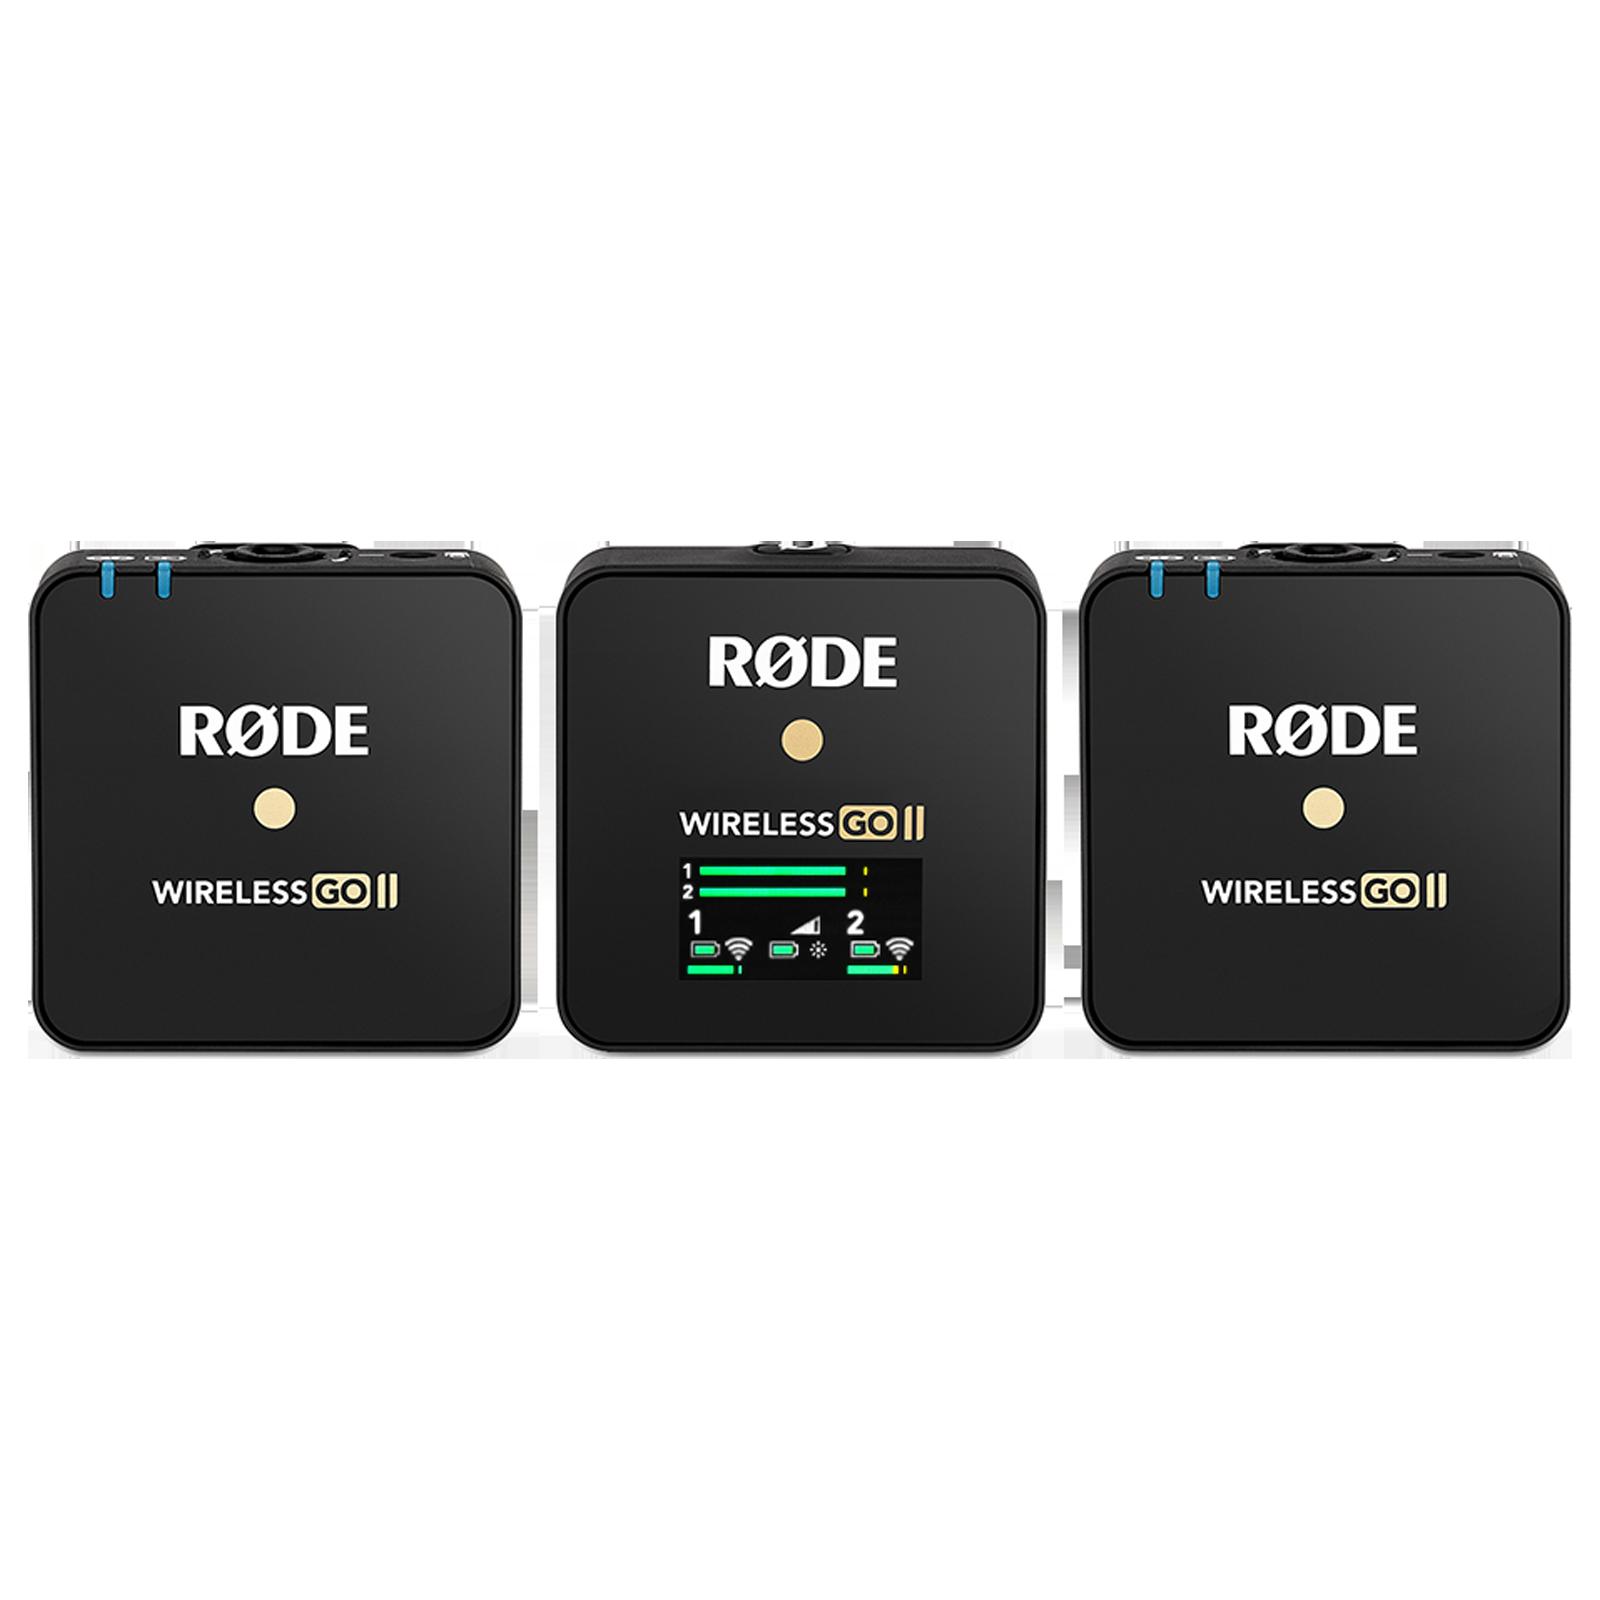 Rode Wireless Go II Hanging Wireless Transmitter Microphone (On-board Recording, WIGOII, Black)_1